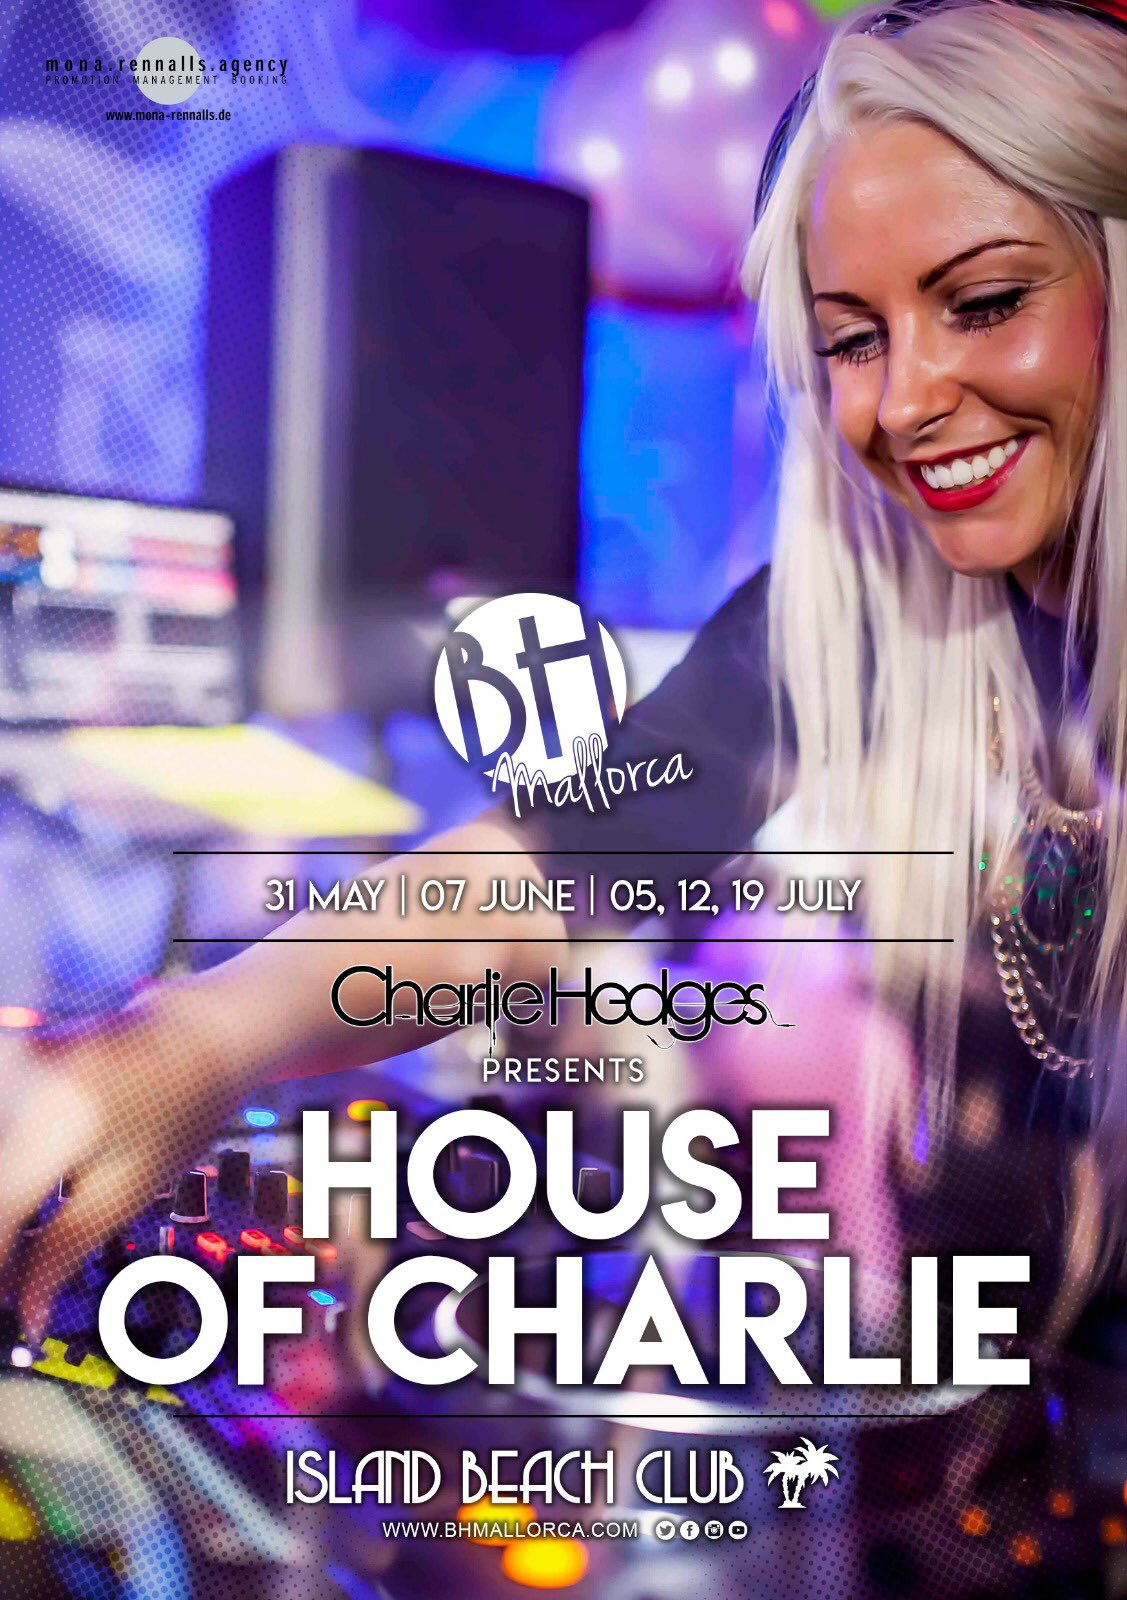 house of charlie.jpg